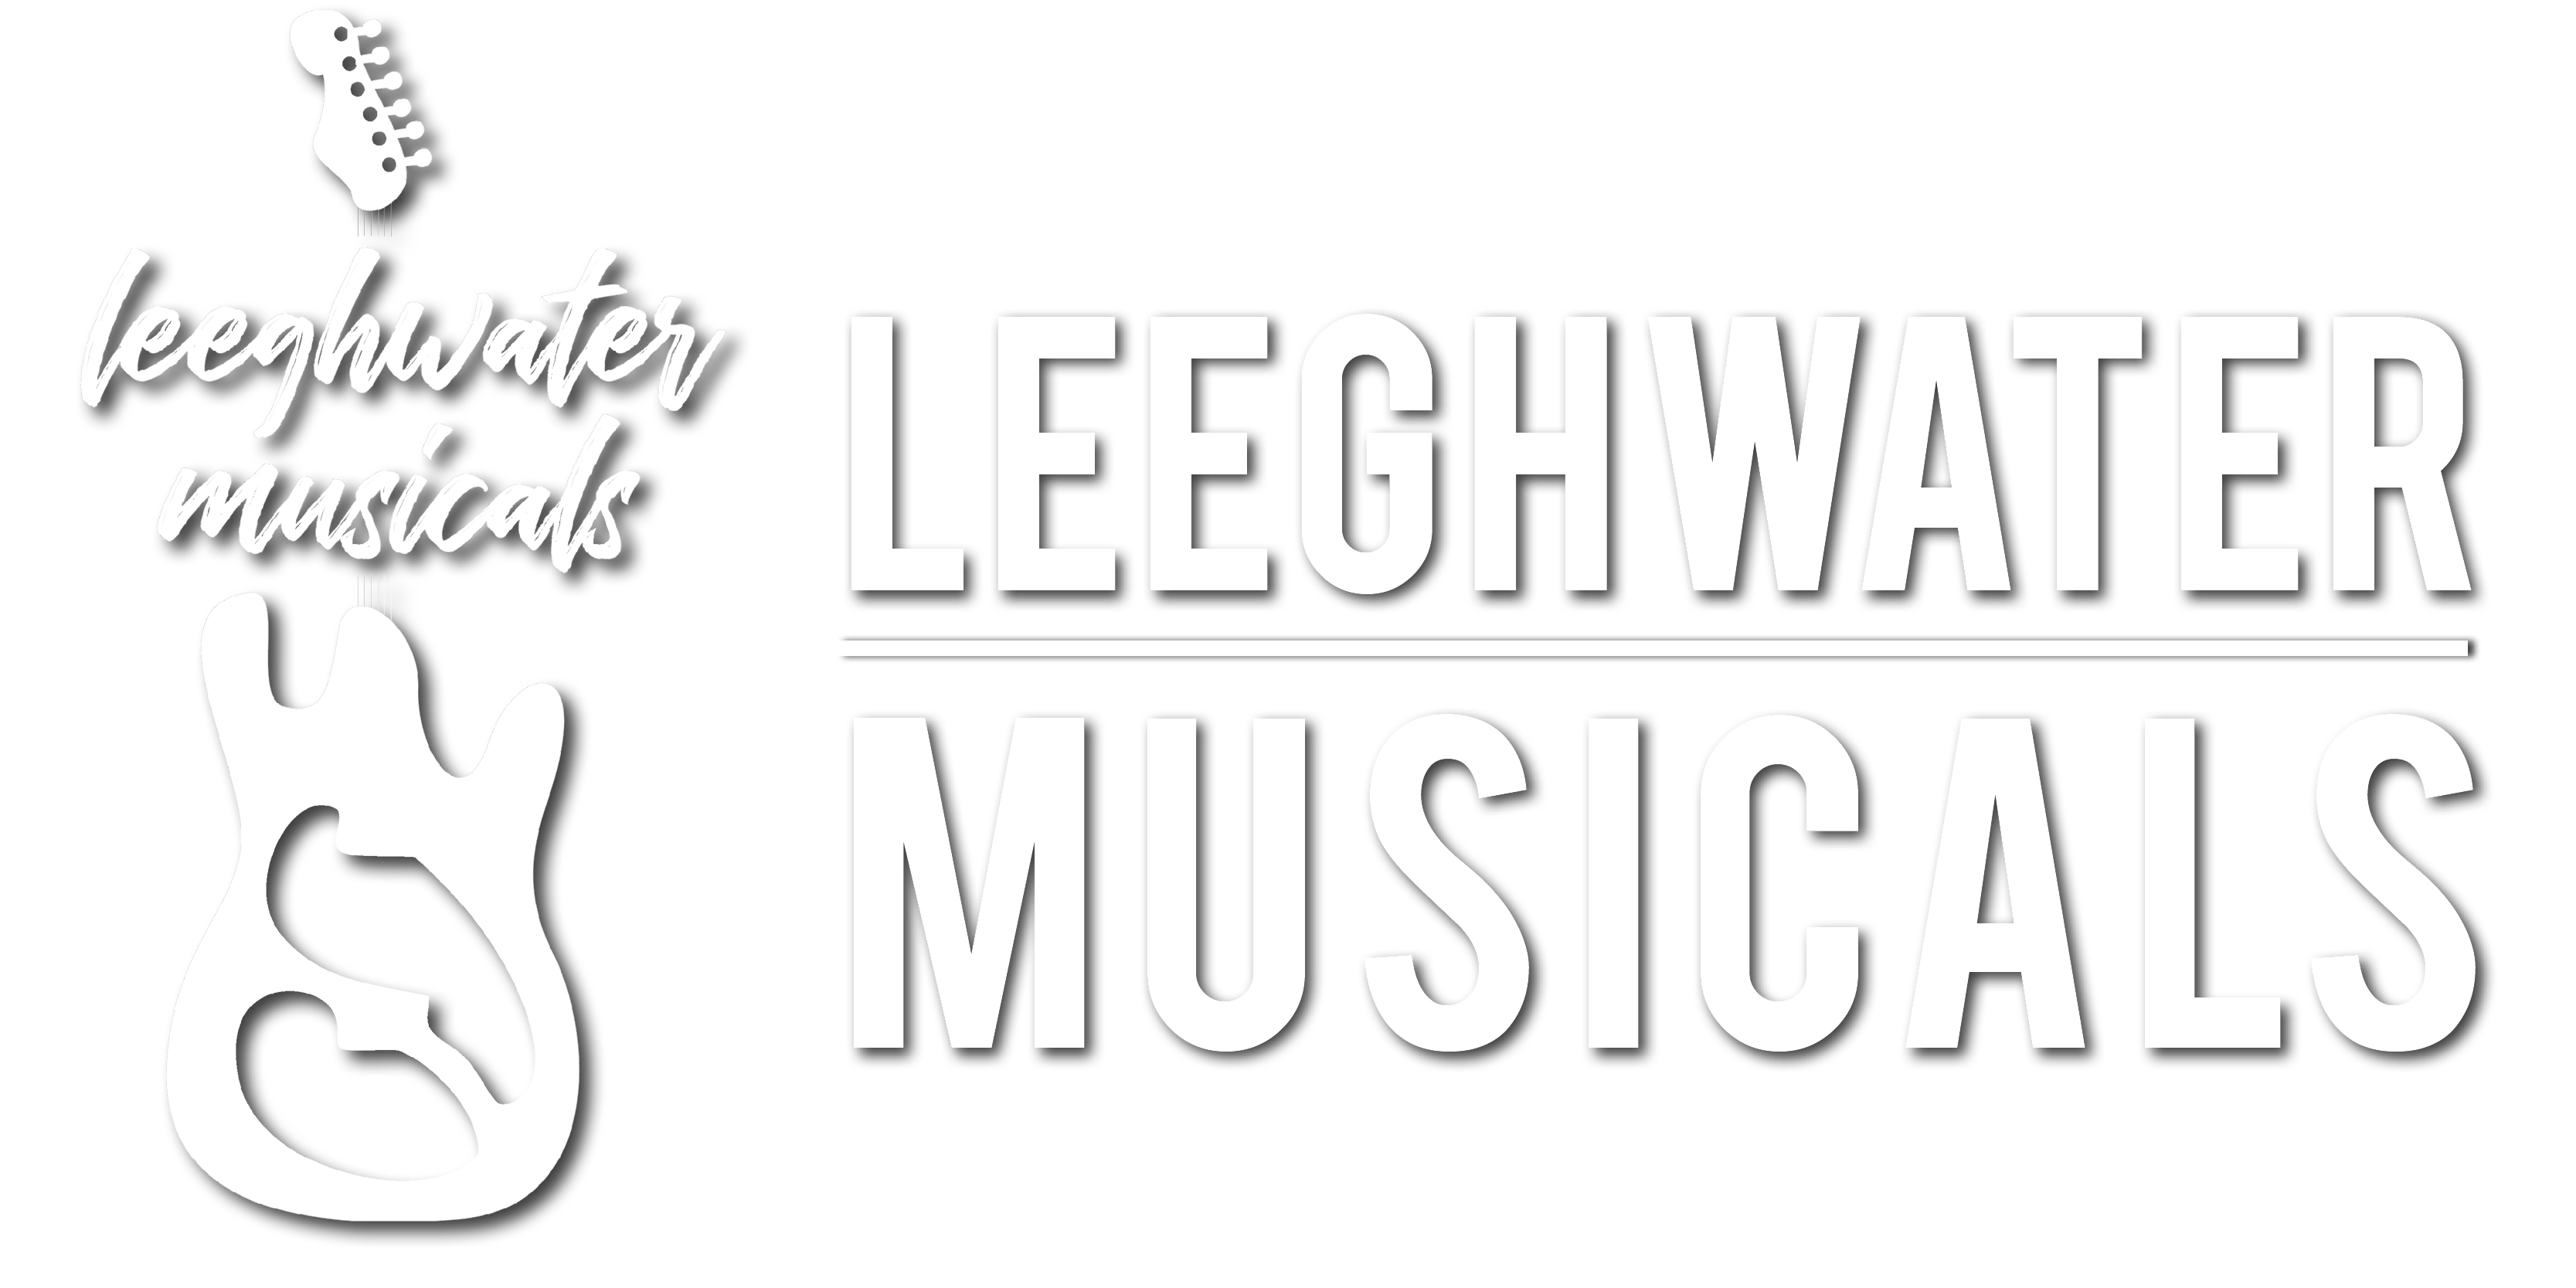 Leeghwater Musicals